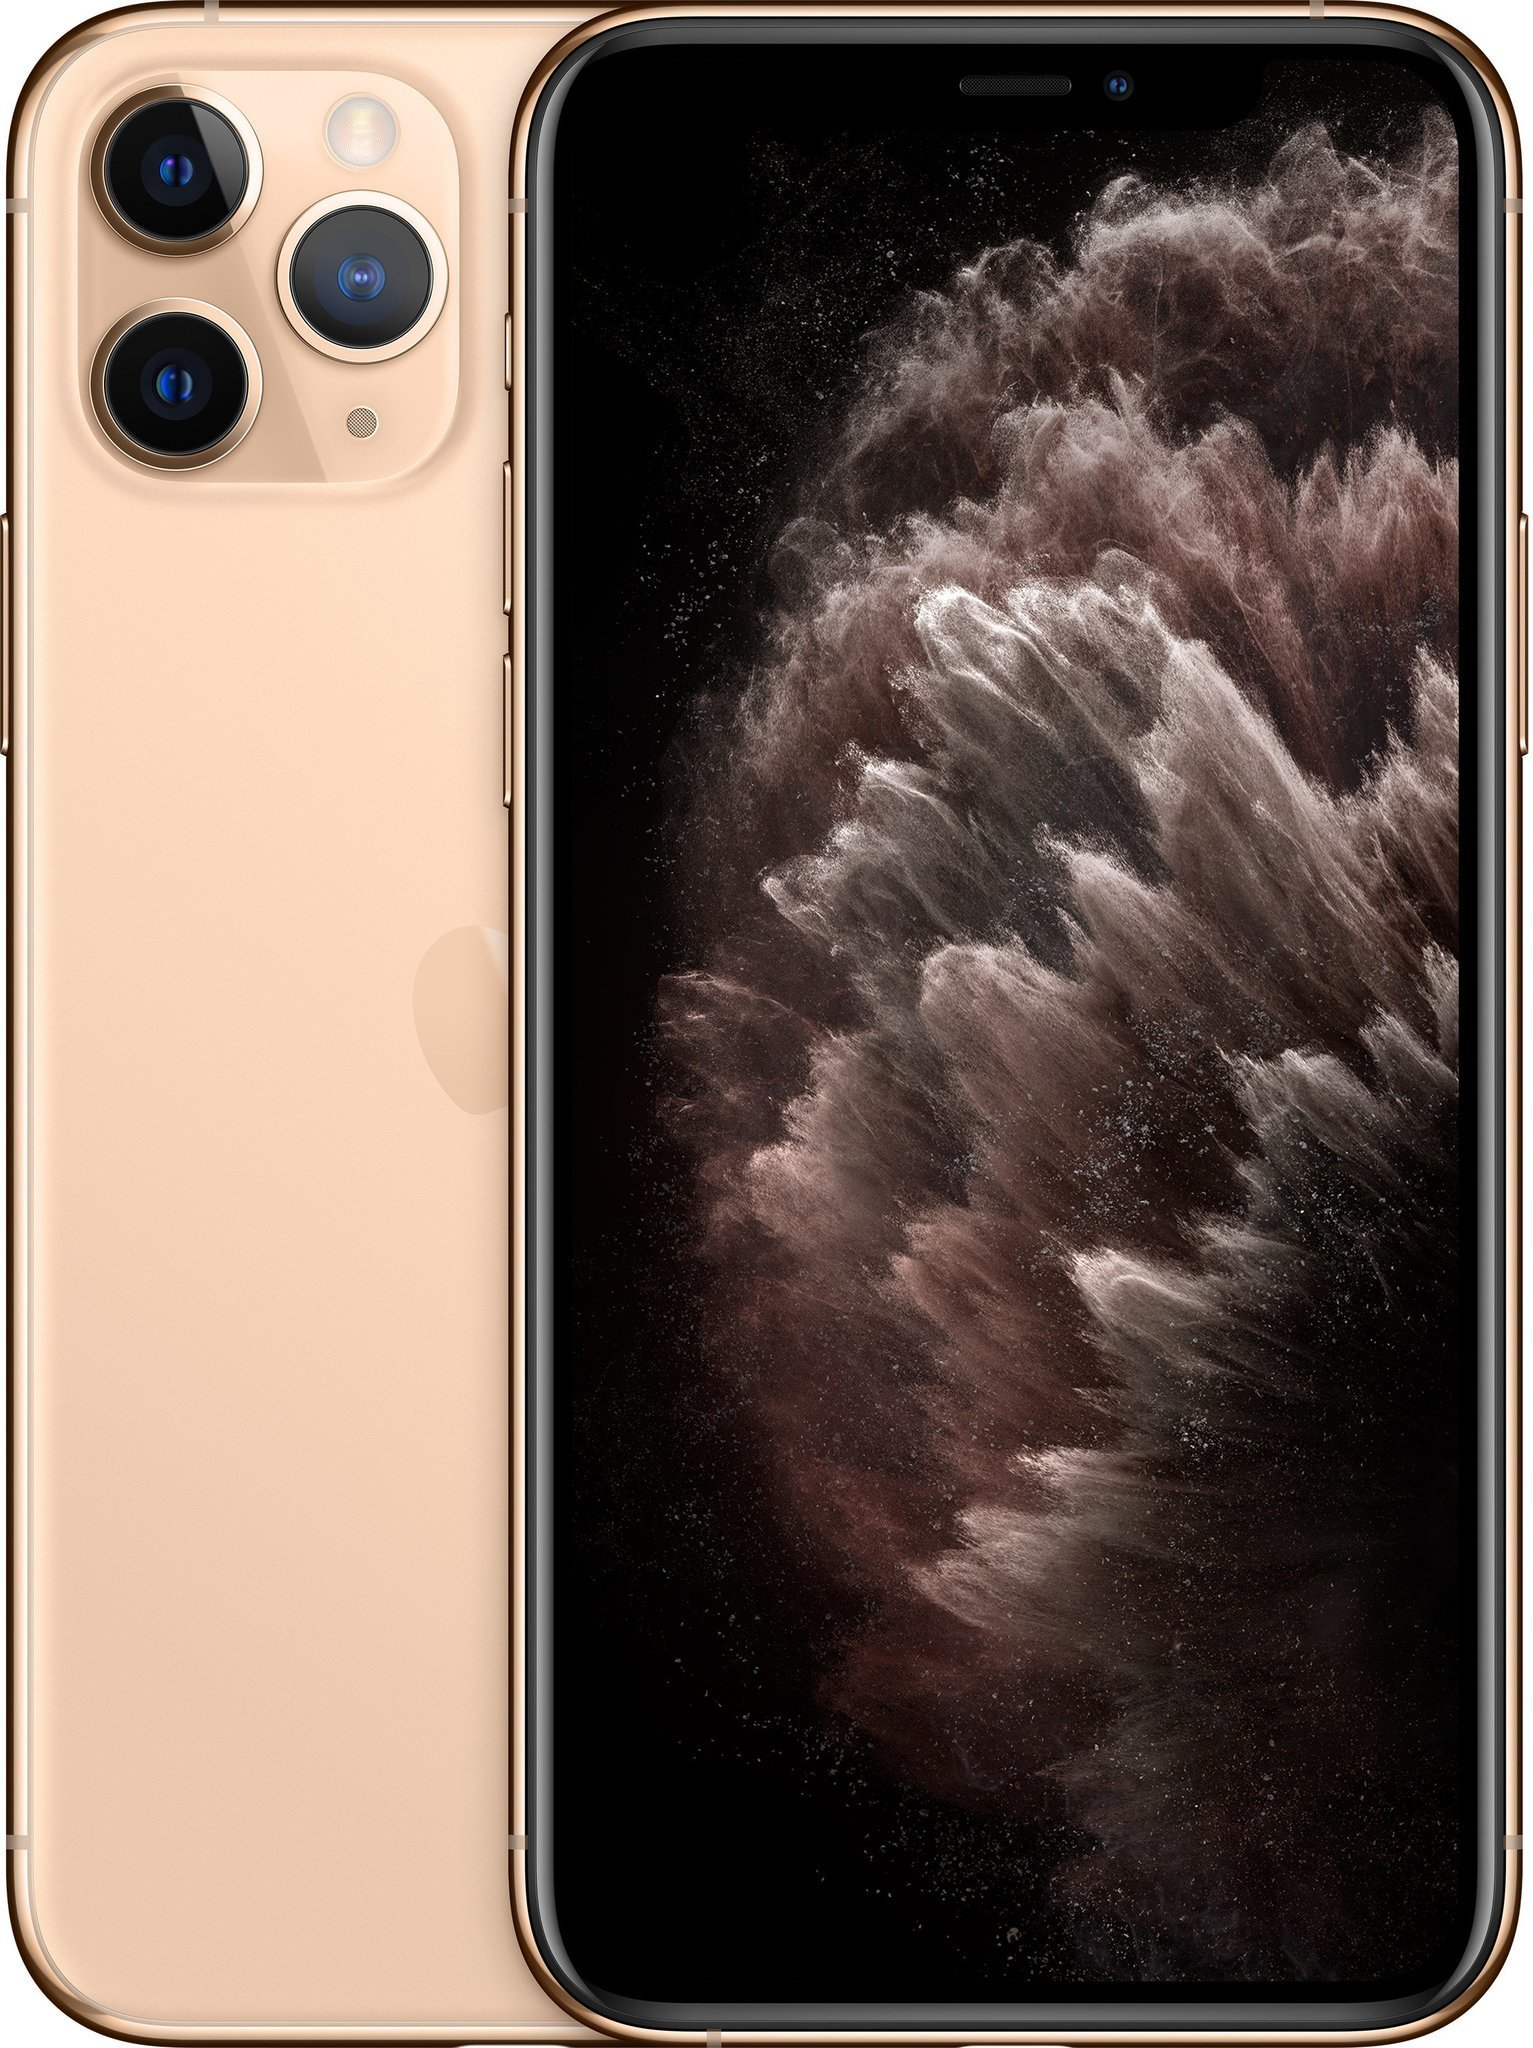 iPhone 11 Pro Max Apple iPhone 11 Pro Max 512gb Золотой gold1.jpg